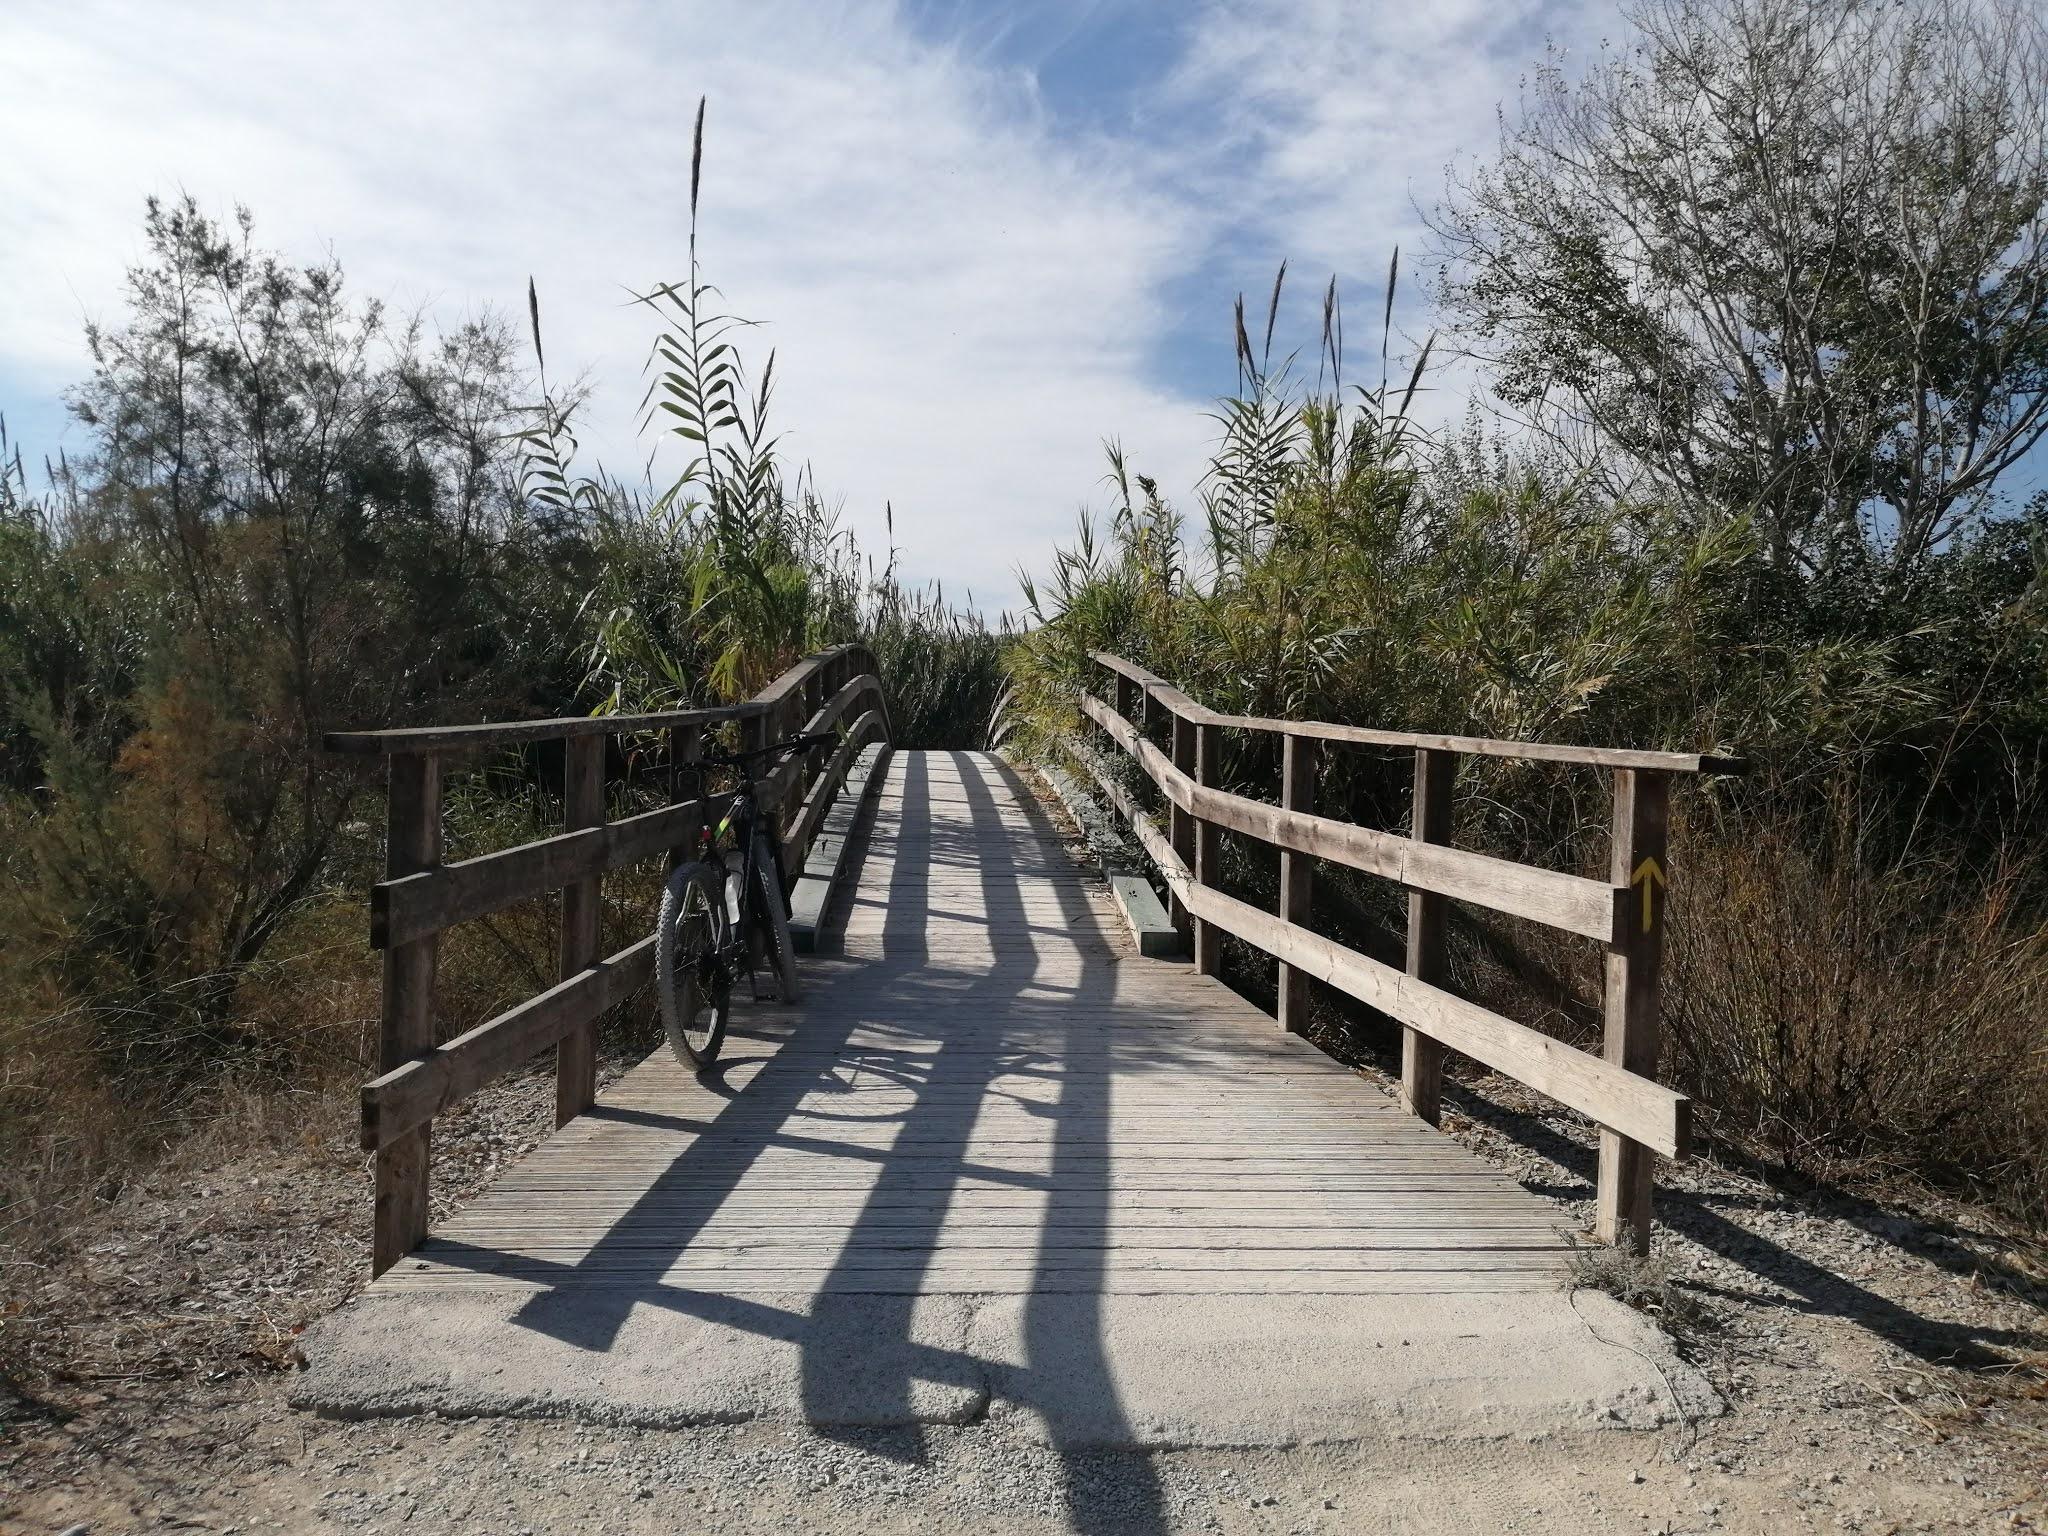 Wooden bridge across the River Turia near Manises, Valencia